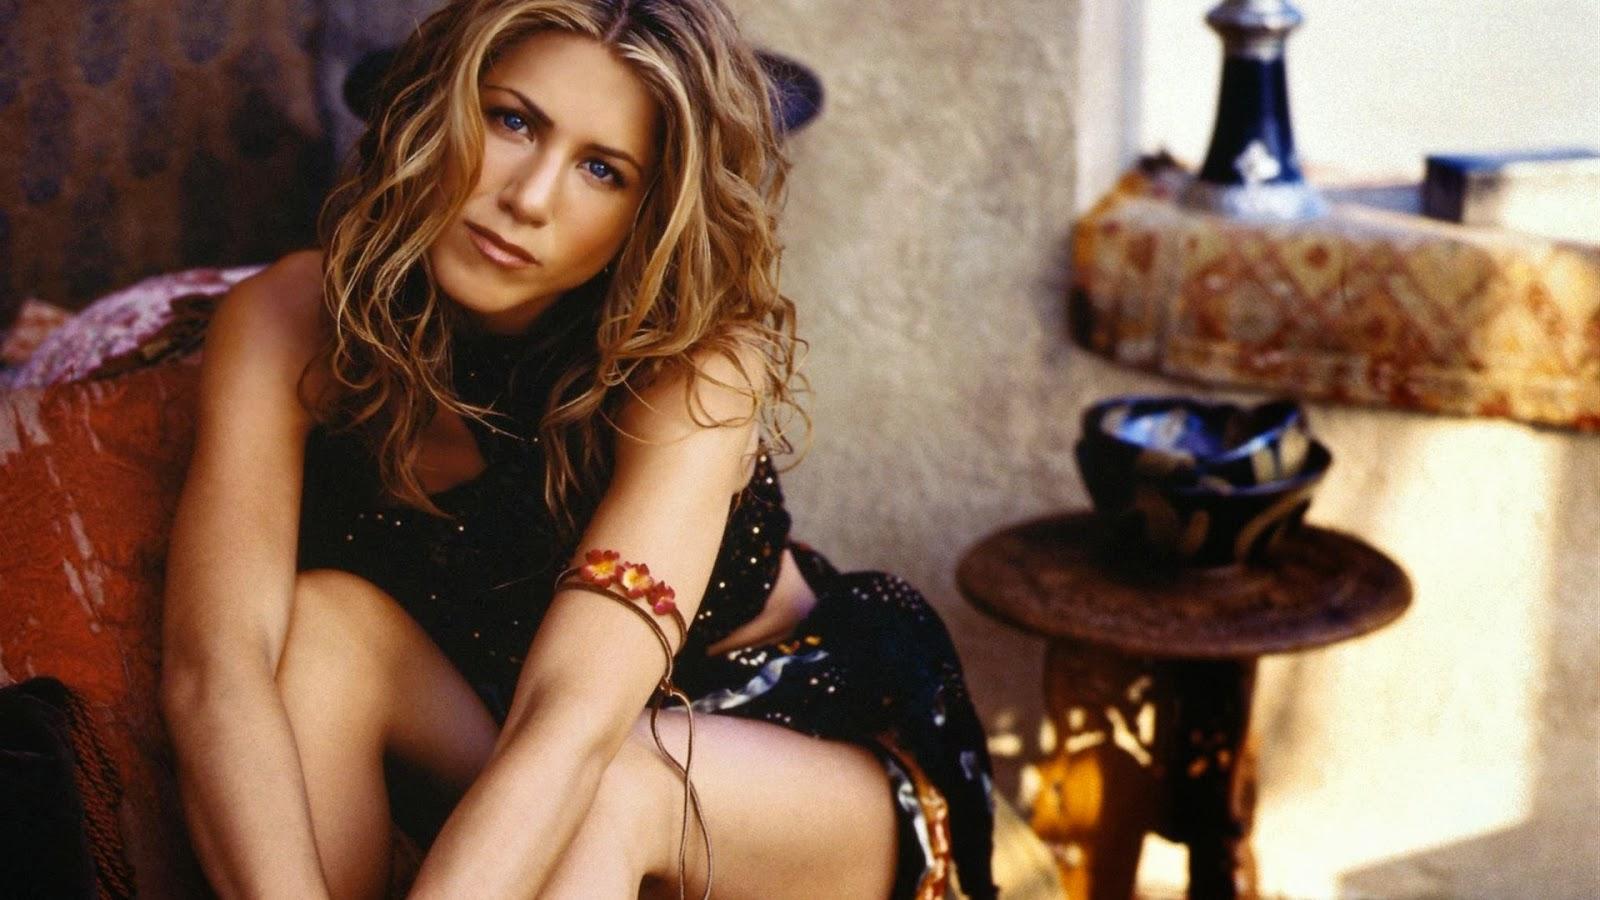 Actress Jennifer Aniston Hot Hd Images  Lifestyles 717-2654